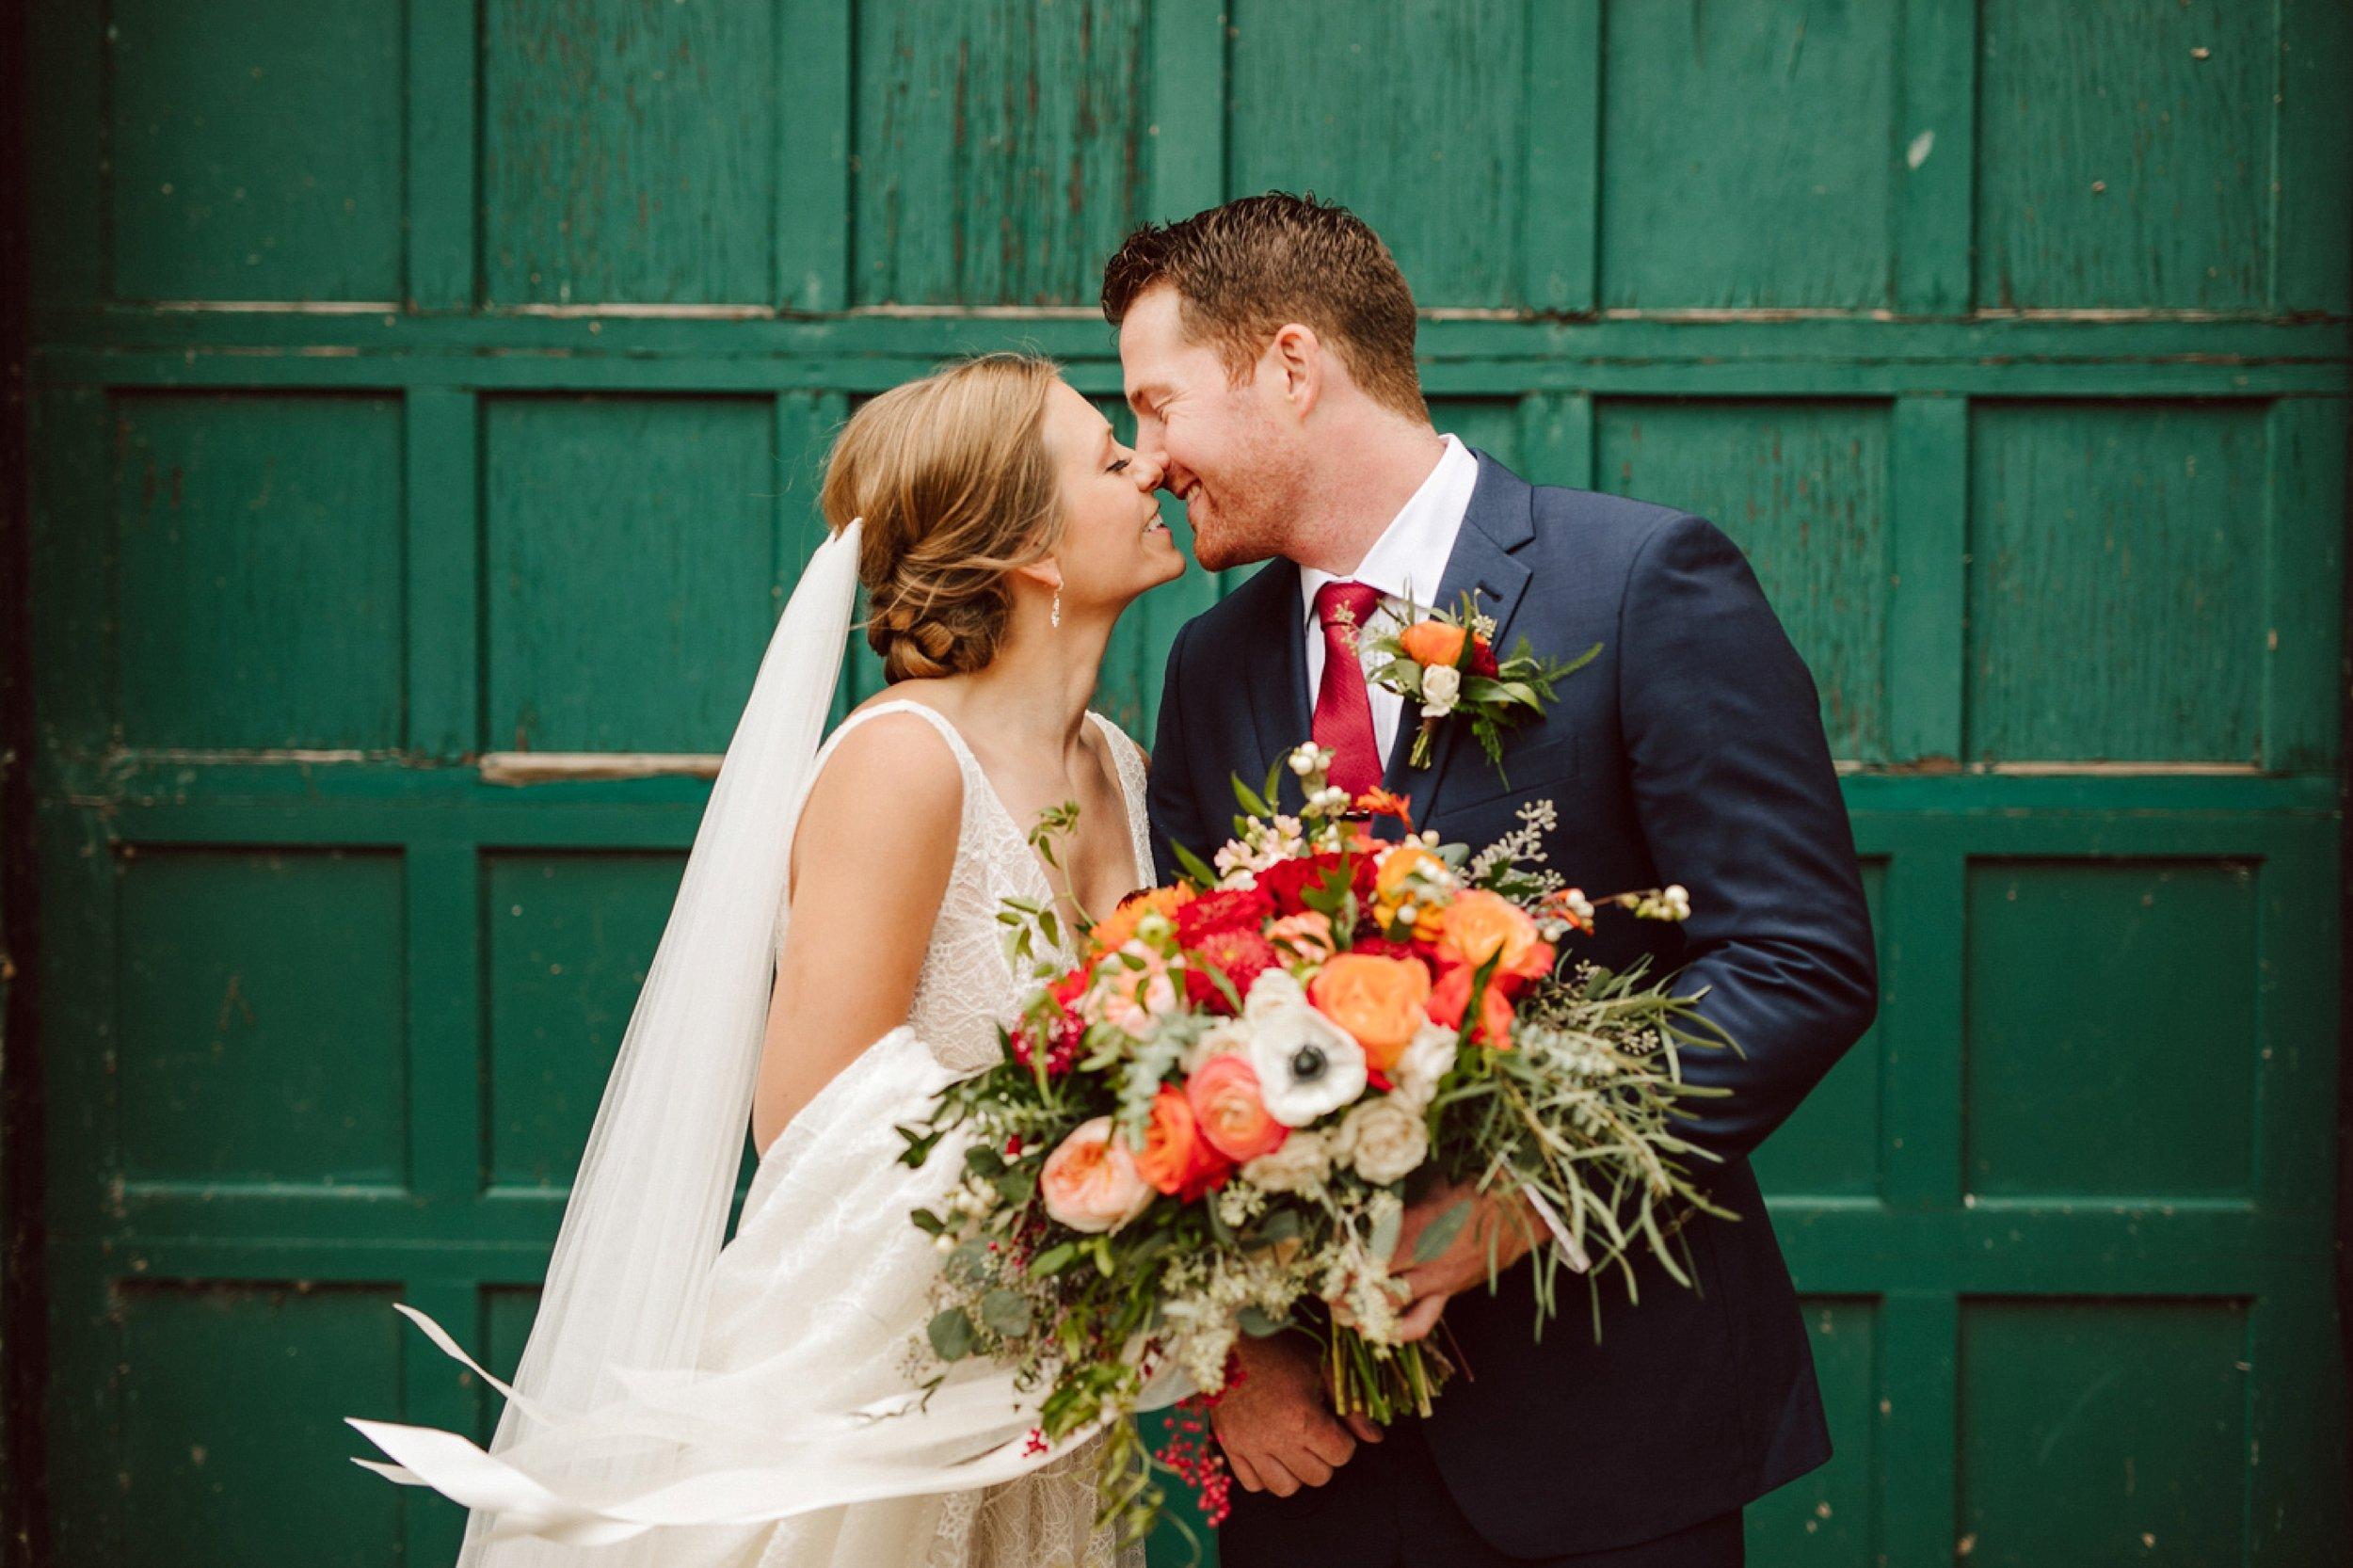 Nicollet-Island-Pavilion-Minneapolis-September-Coral-Navy-Wedding-50.jpg